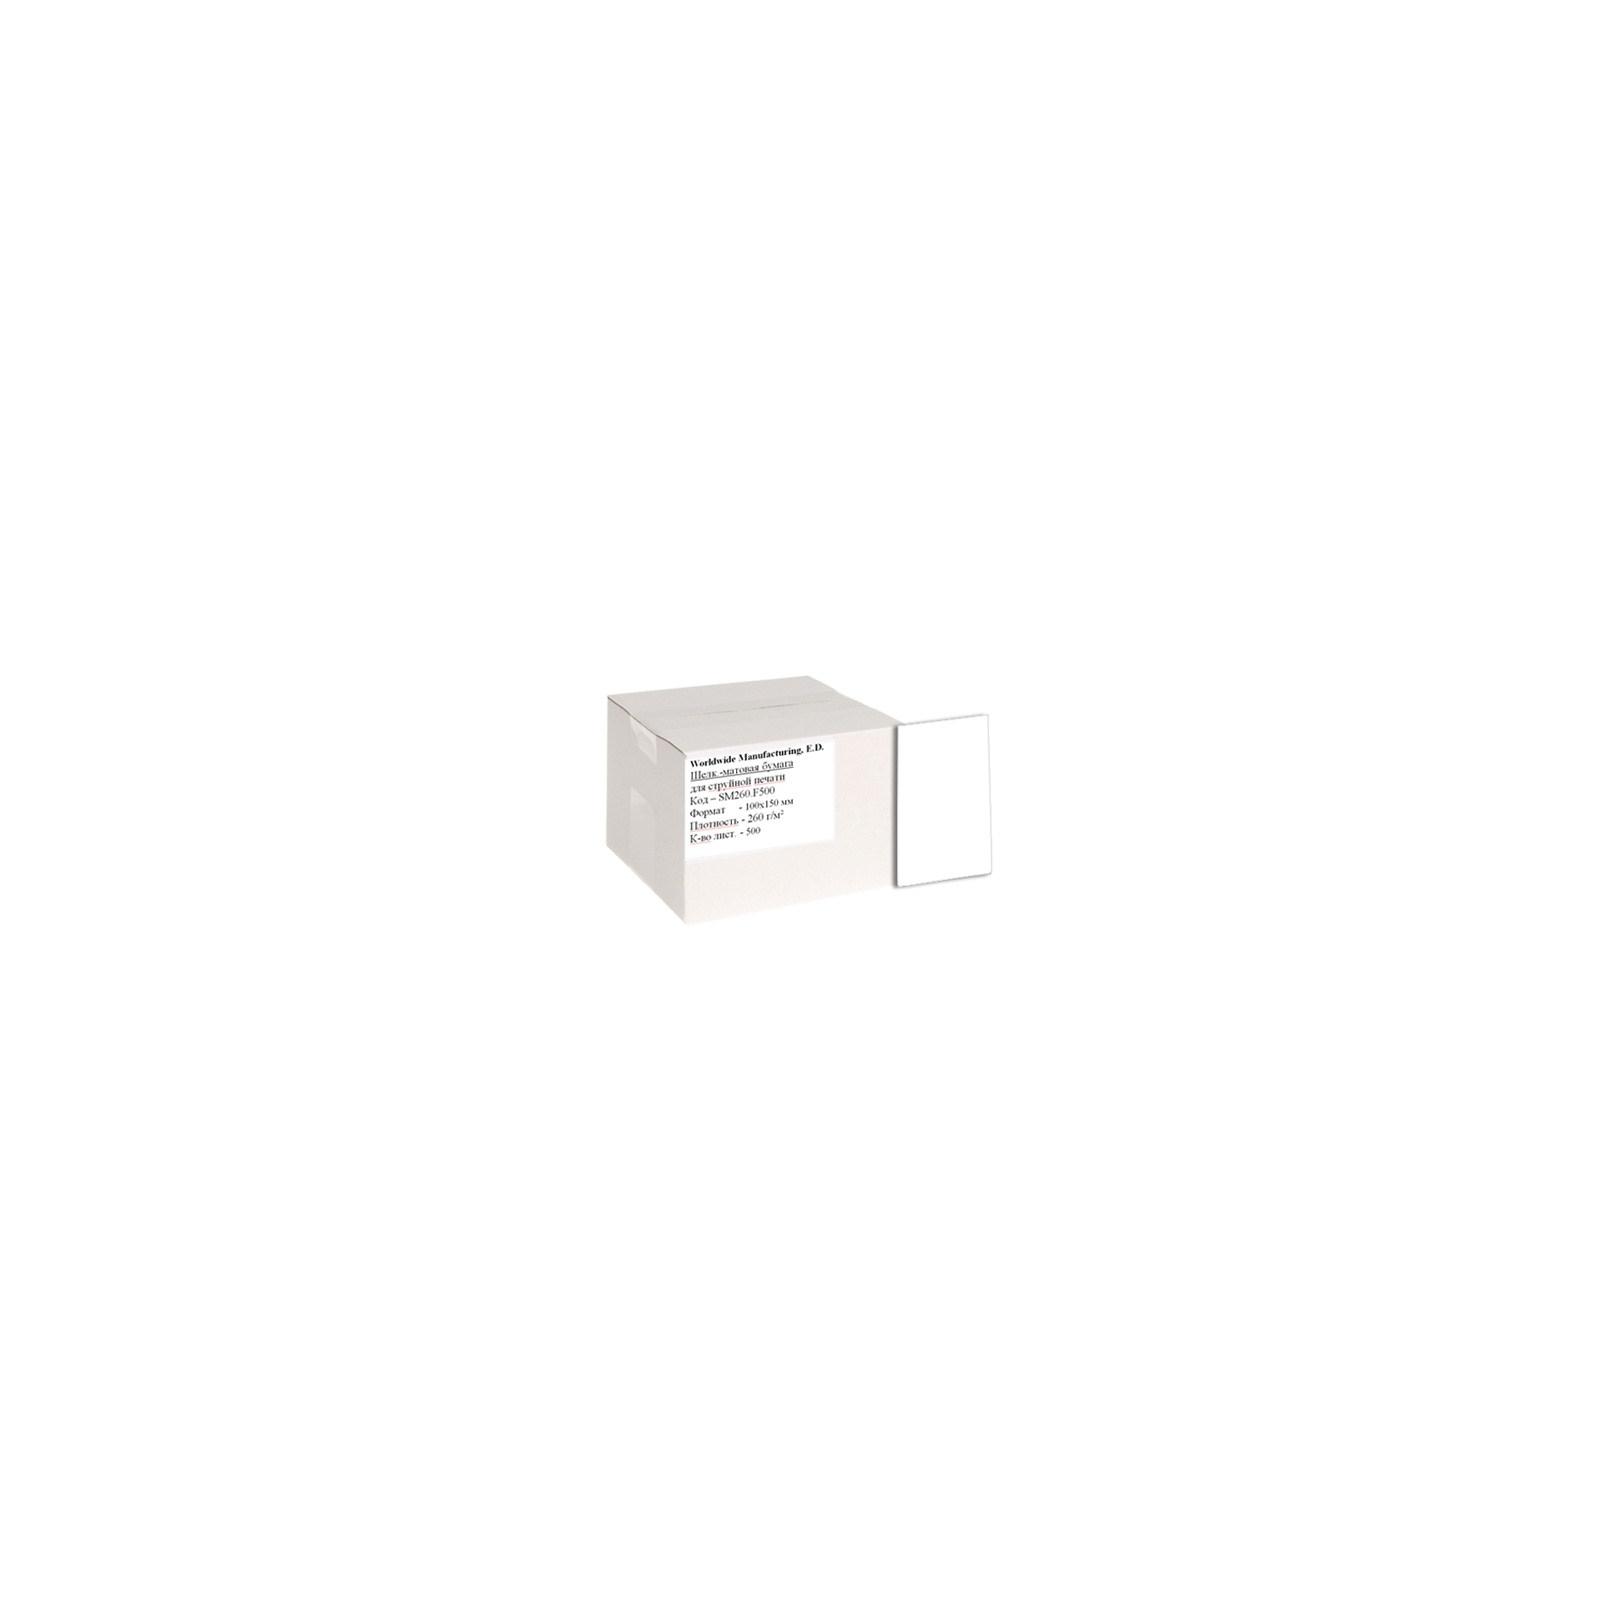 Бумага WWM 10x15 (SM260.F500)